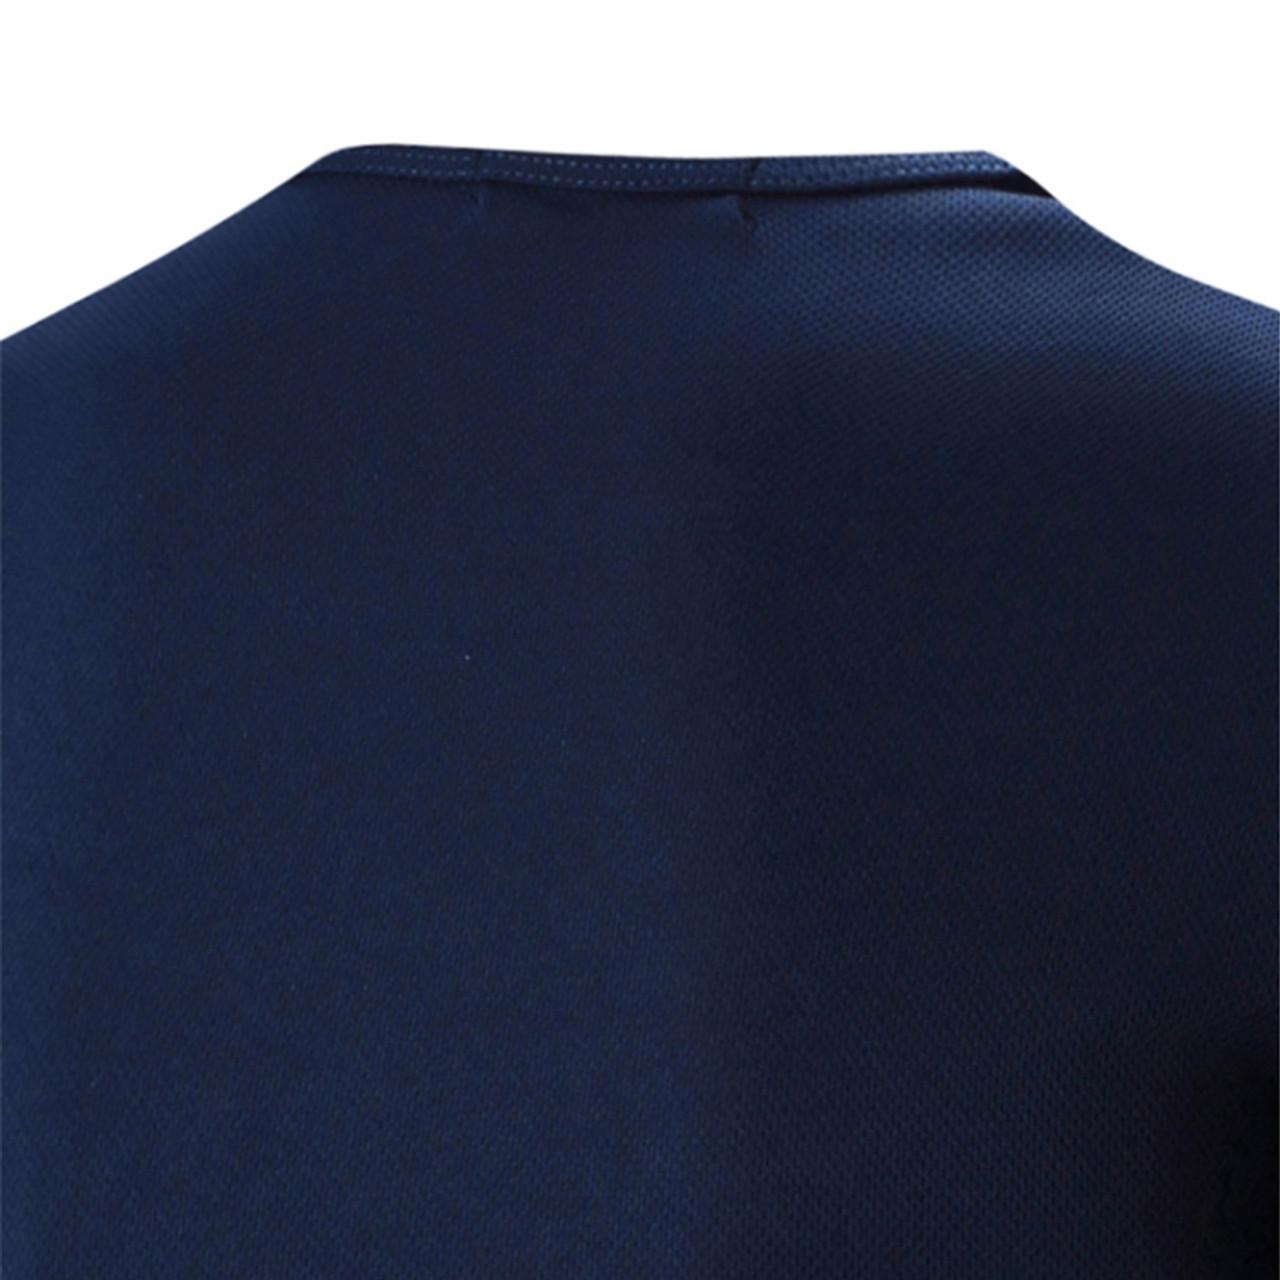 adb85146440e ... T Shirt Men 2018 New Brand Summer High Quality Short Sleeve Printing  Casual Male T-